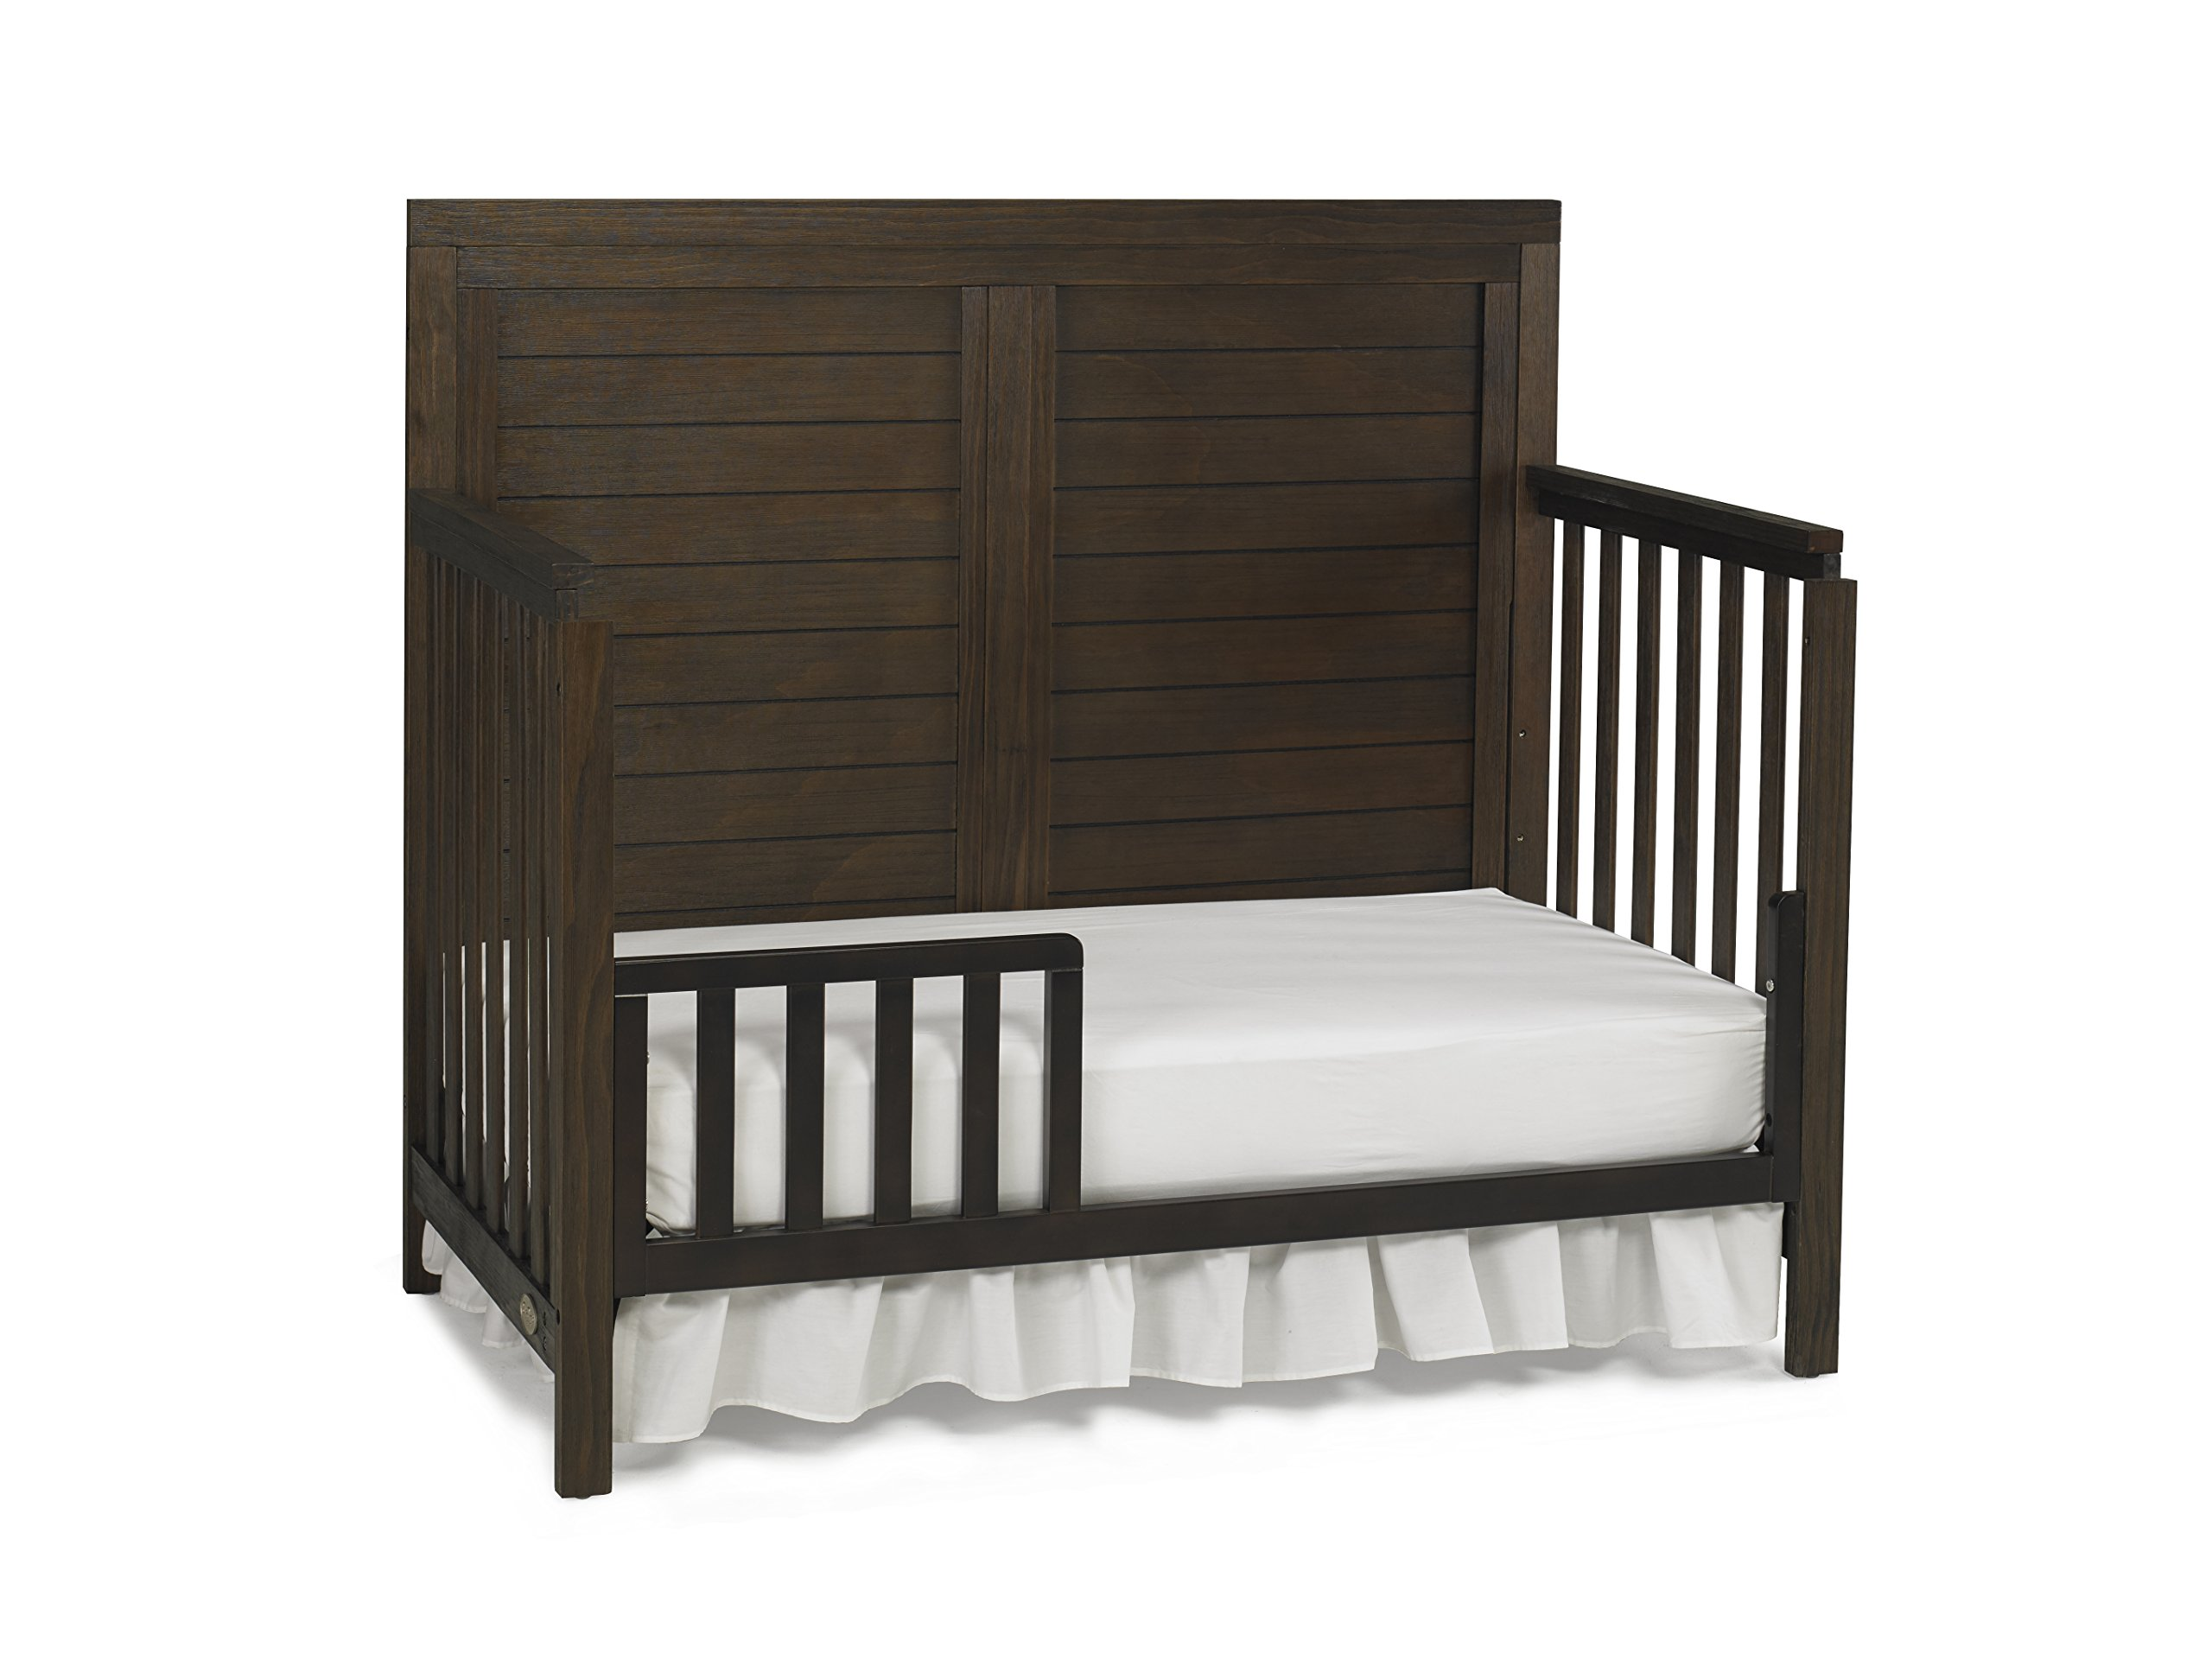 Ti Amo Castello 4 in 1 Convertible Crib, Wire Brushed Brown by Tiamo (Image #6)